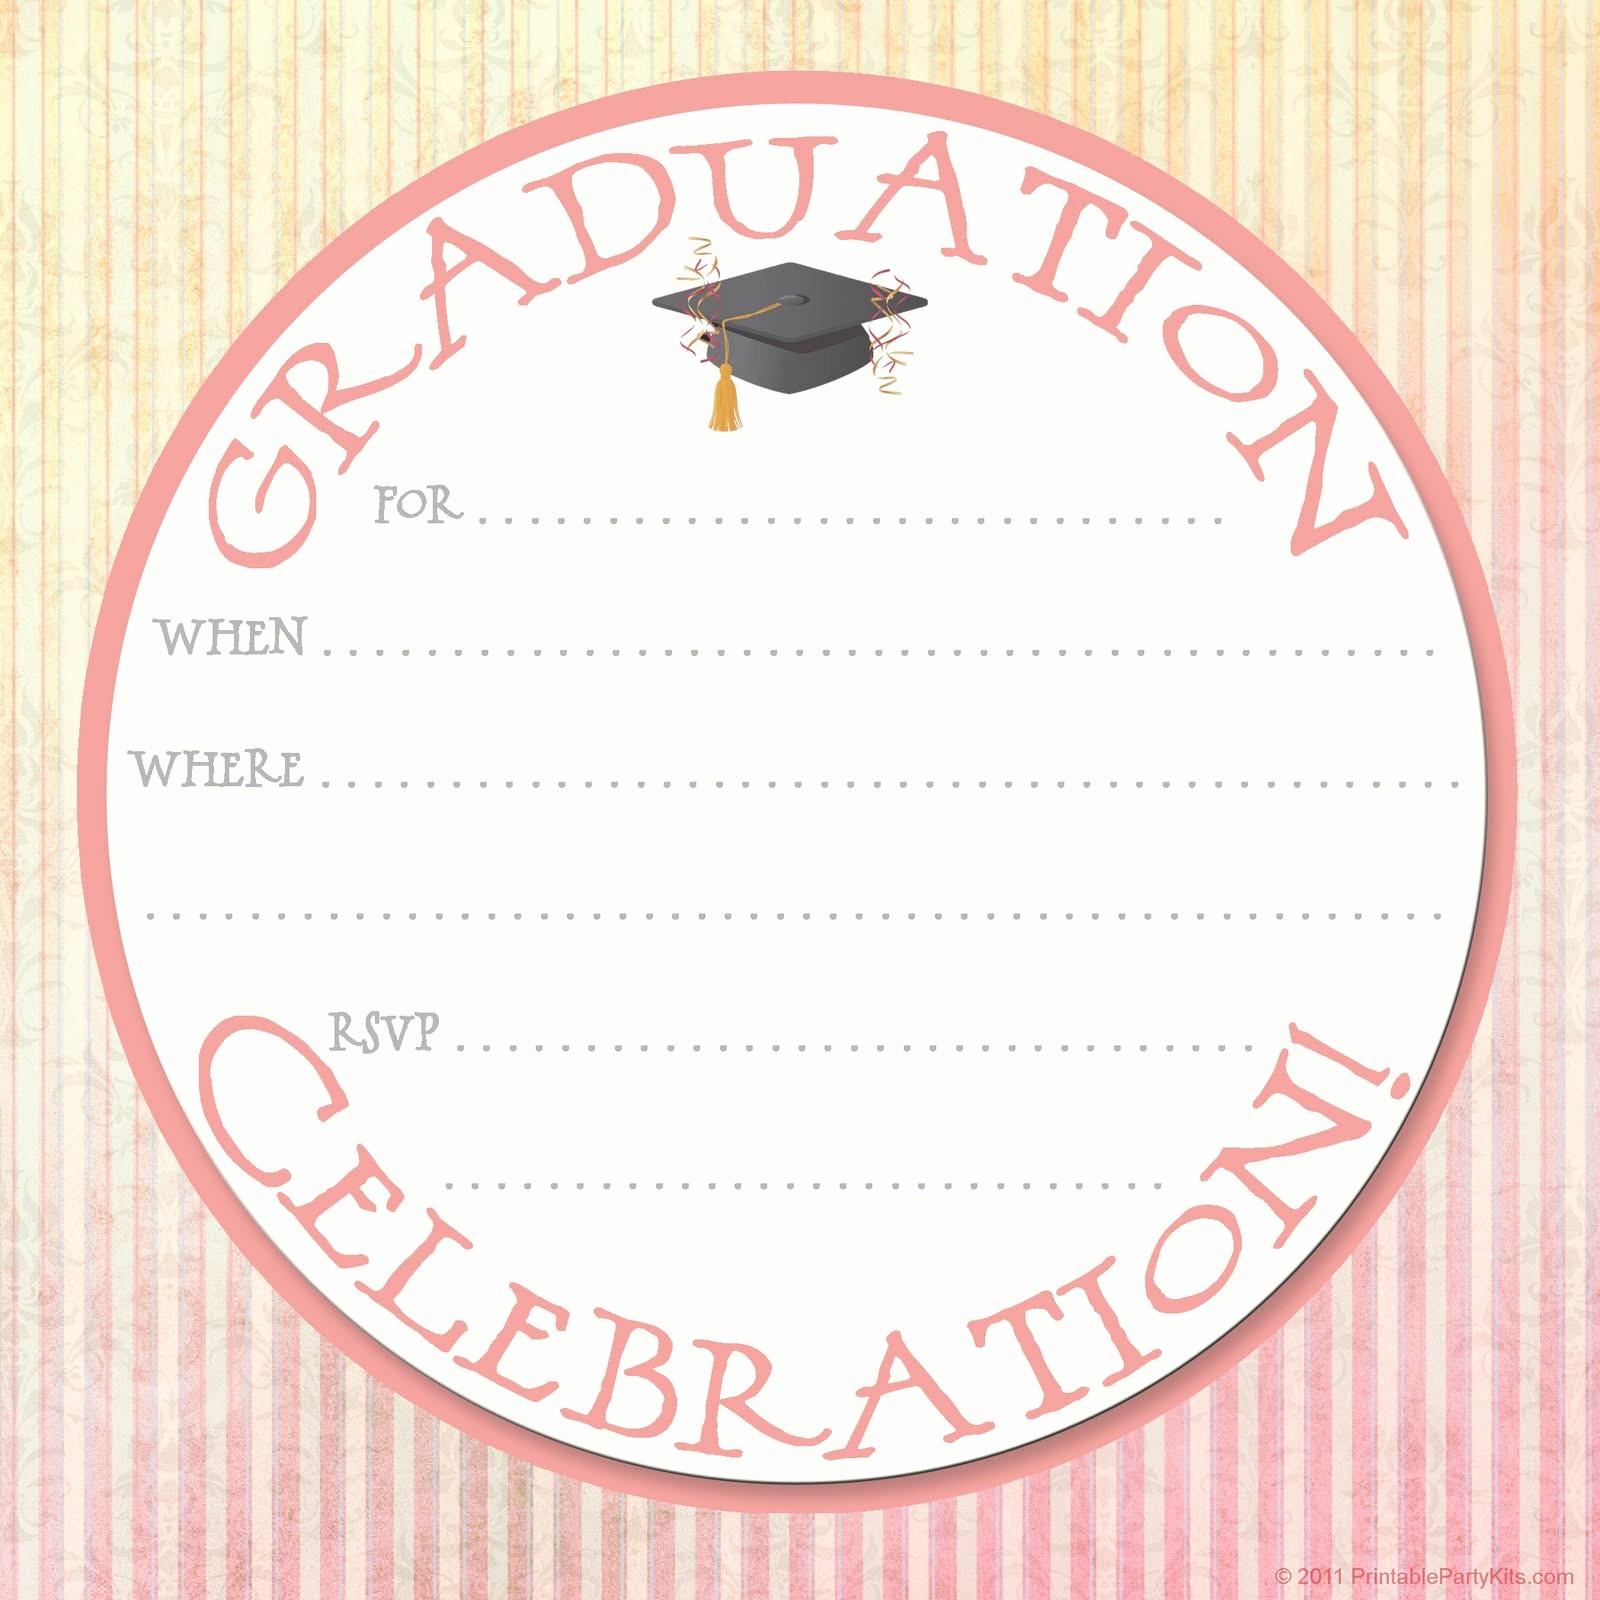 Free Graduation Party Invitations Templates Fresh Free Printable Party Invitations Graduation Party